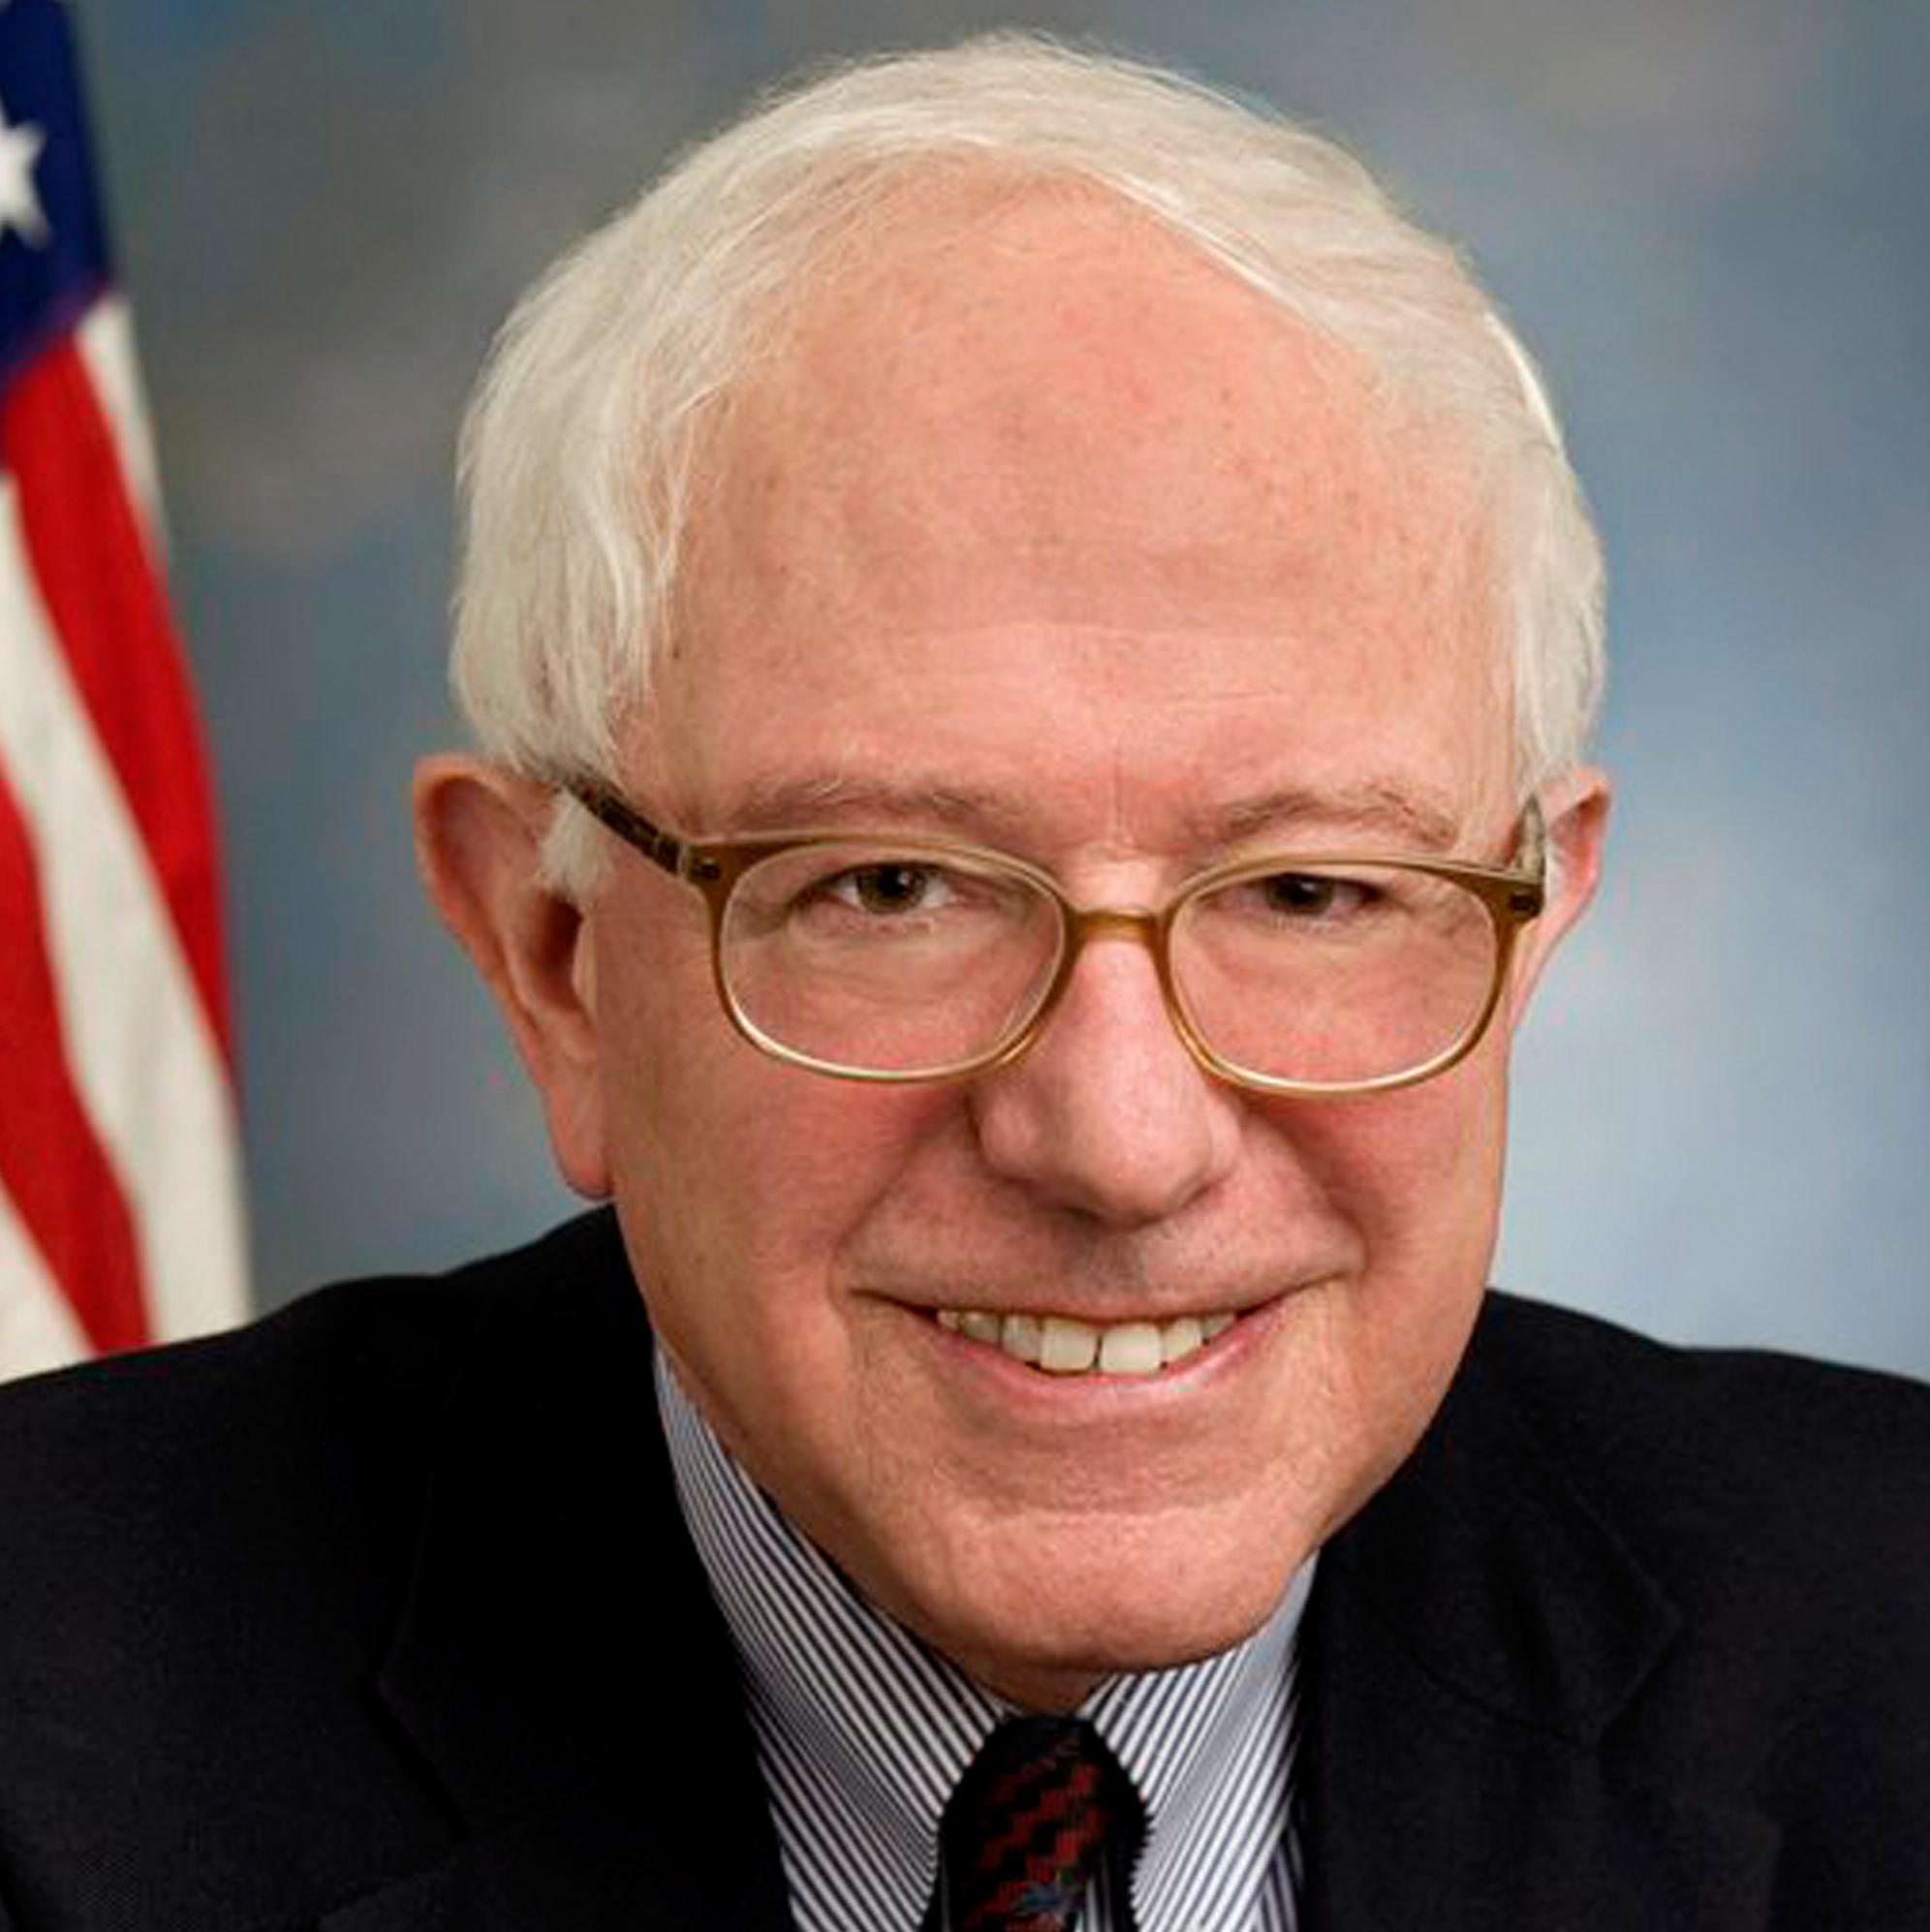 743c627f4e6afd5093c0_Bernie_Sanders.jpg